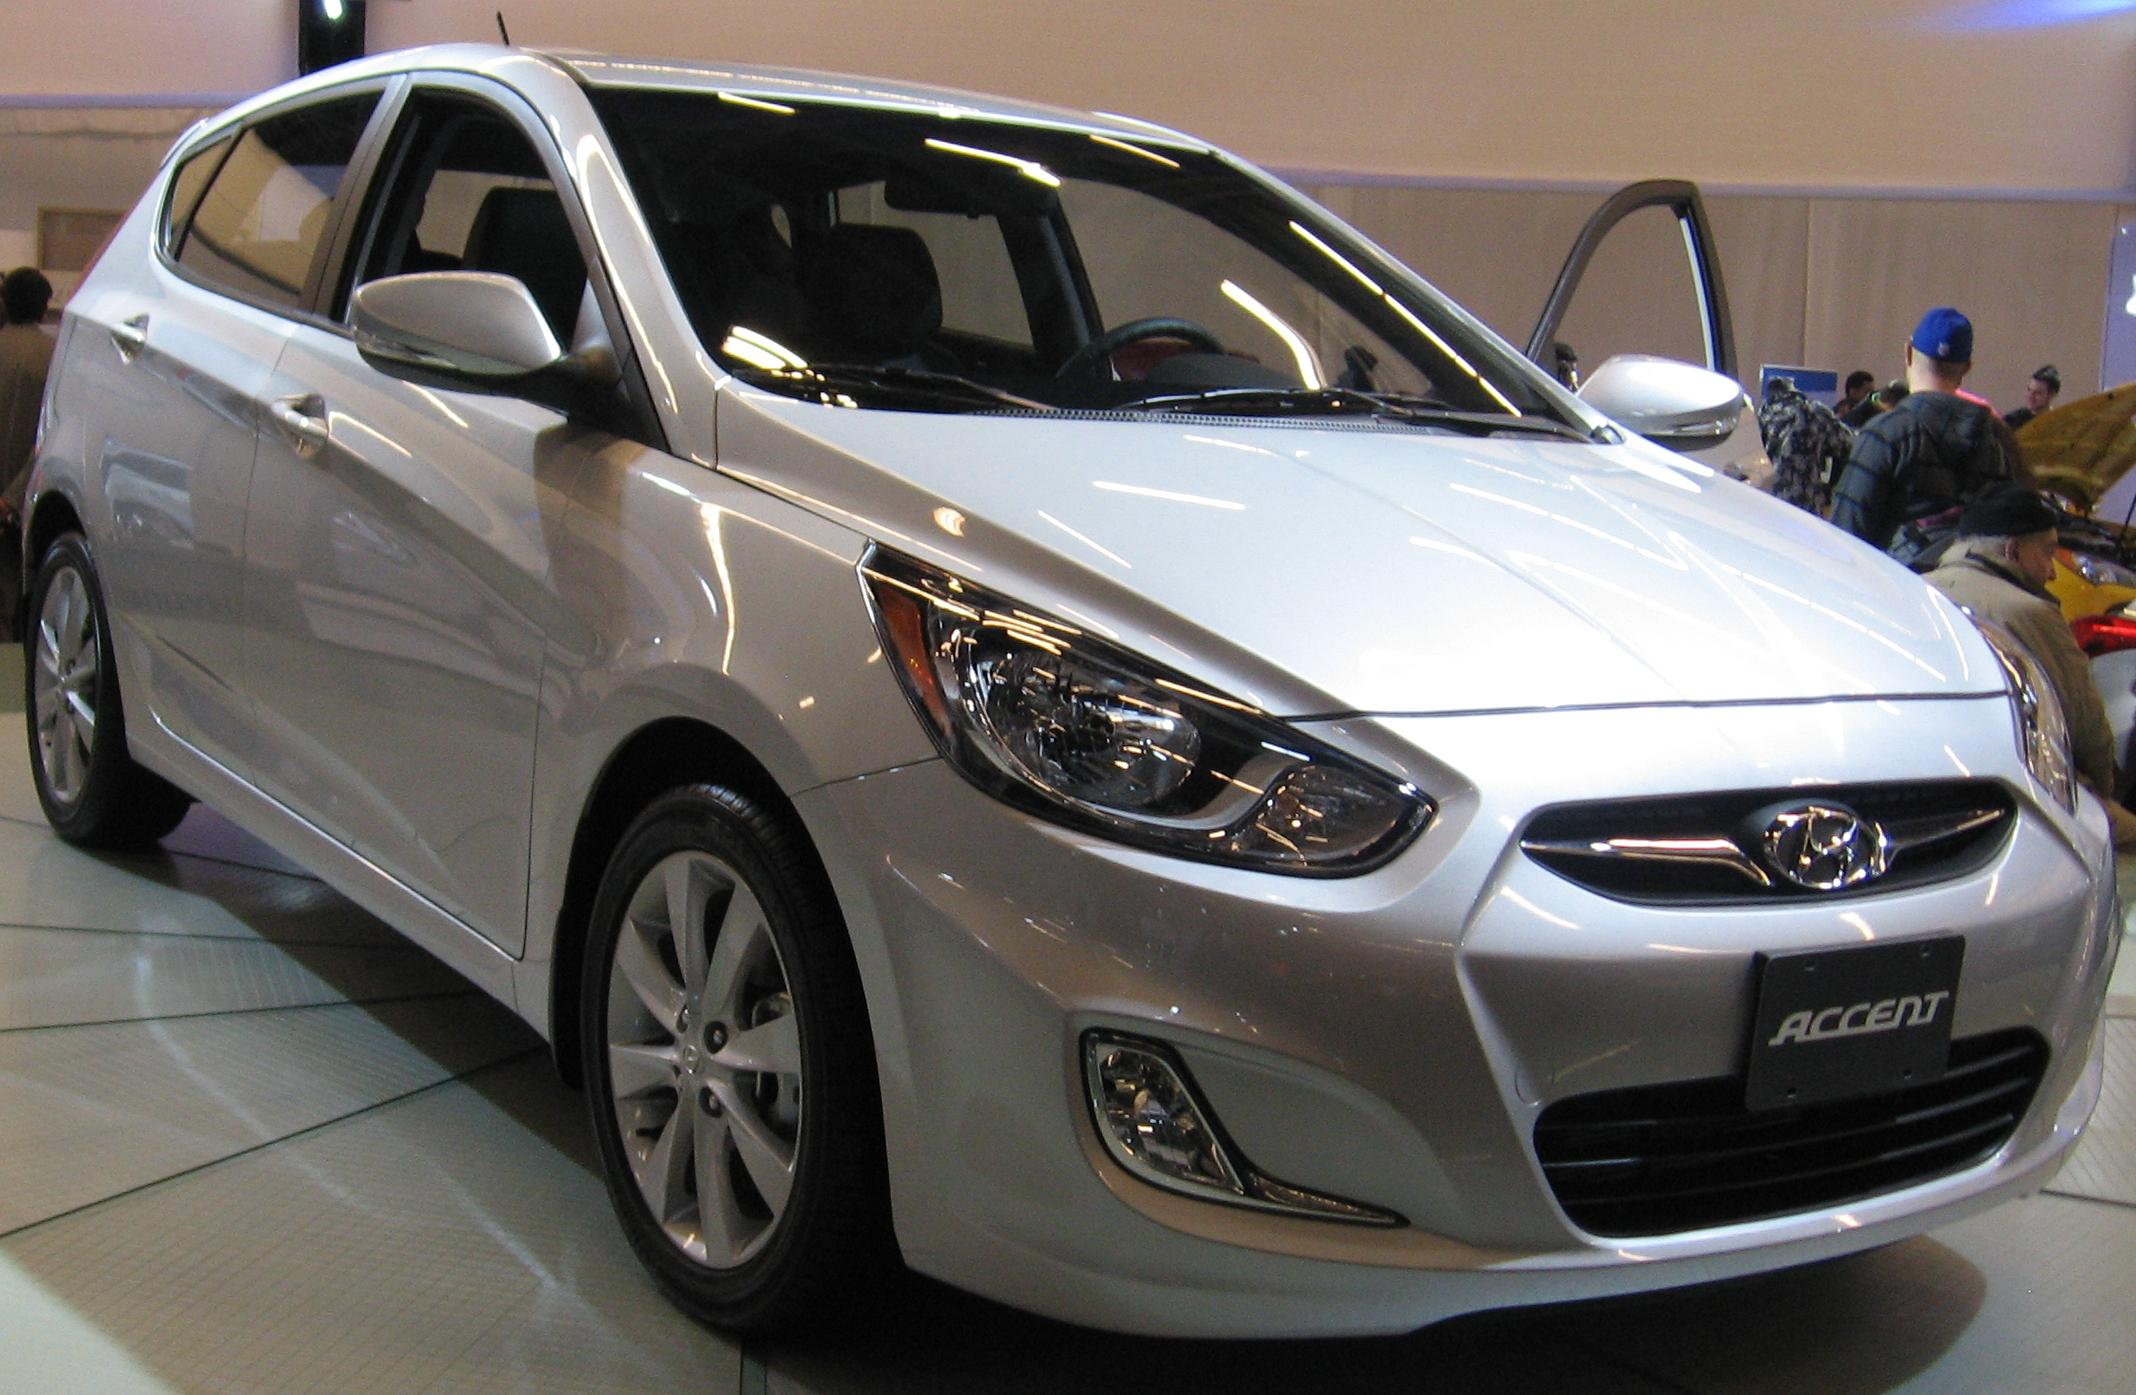 Hyundai Accent Hatchback >> File 12 Hyundai Accent Hatchback Mias 11 Jpg Wikipedia